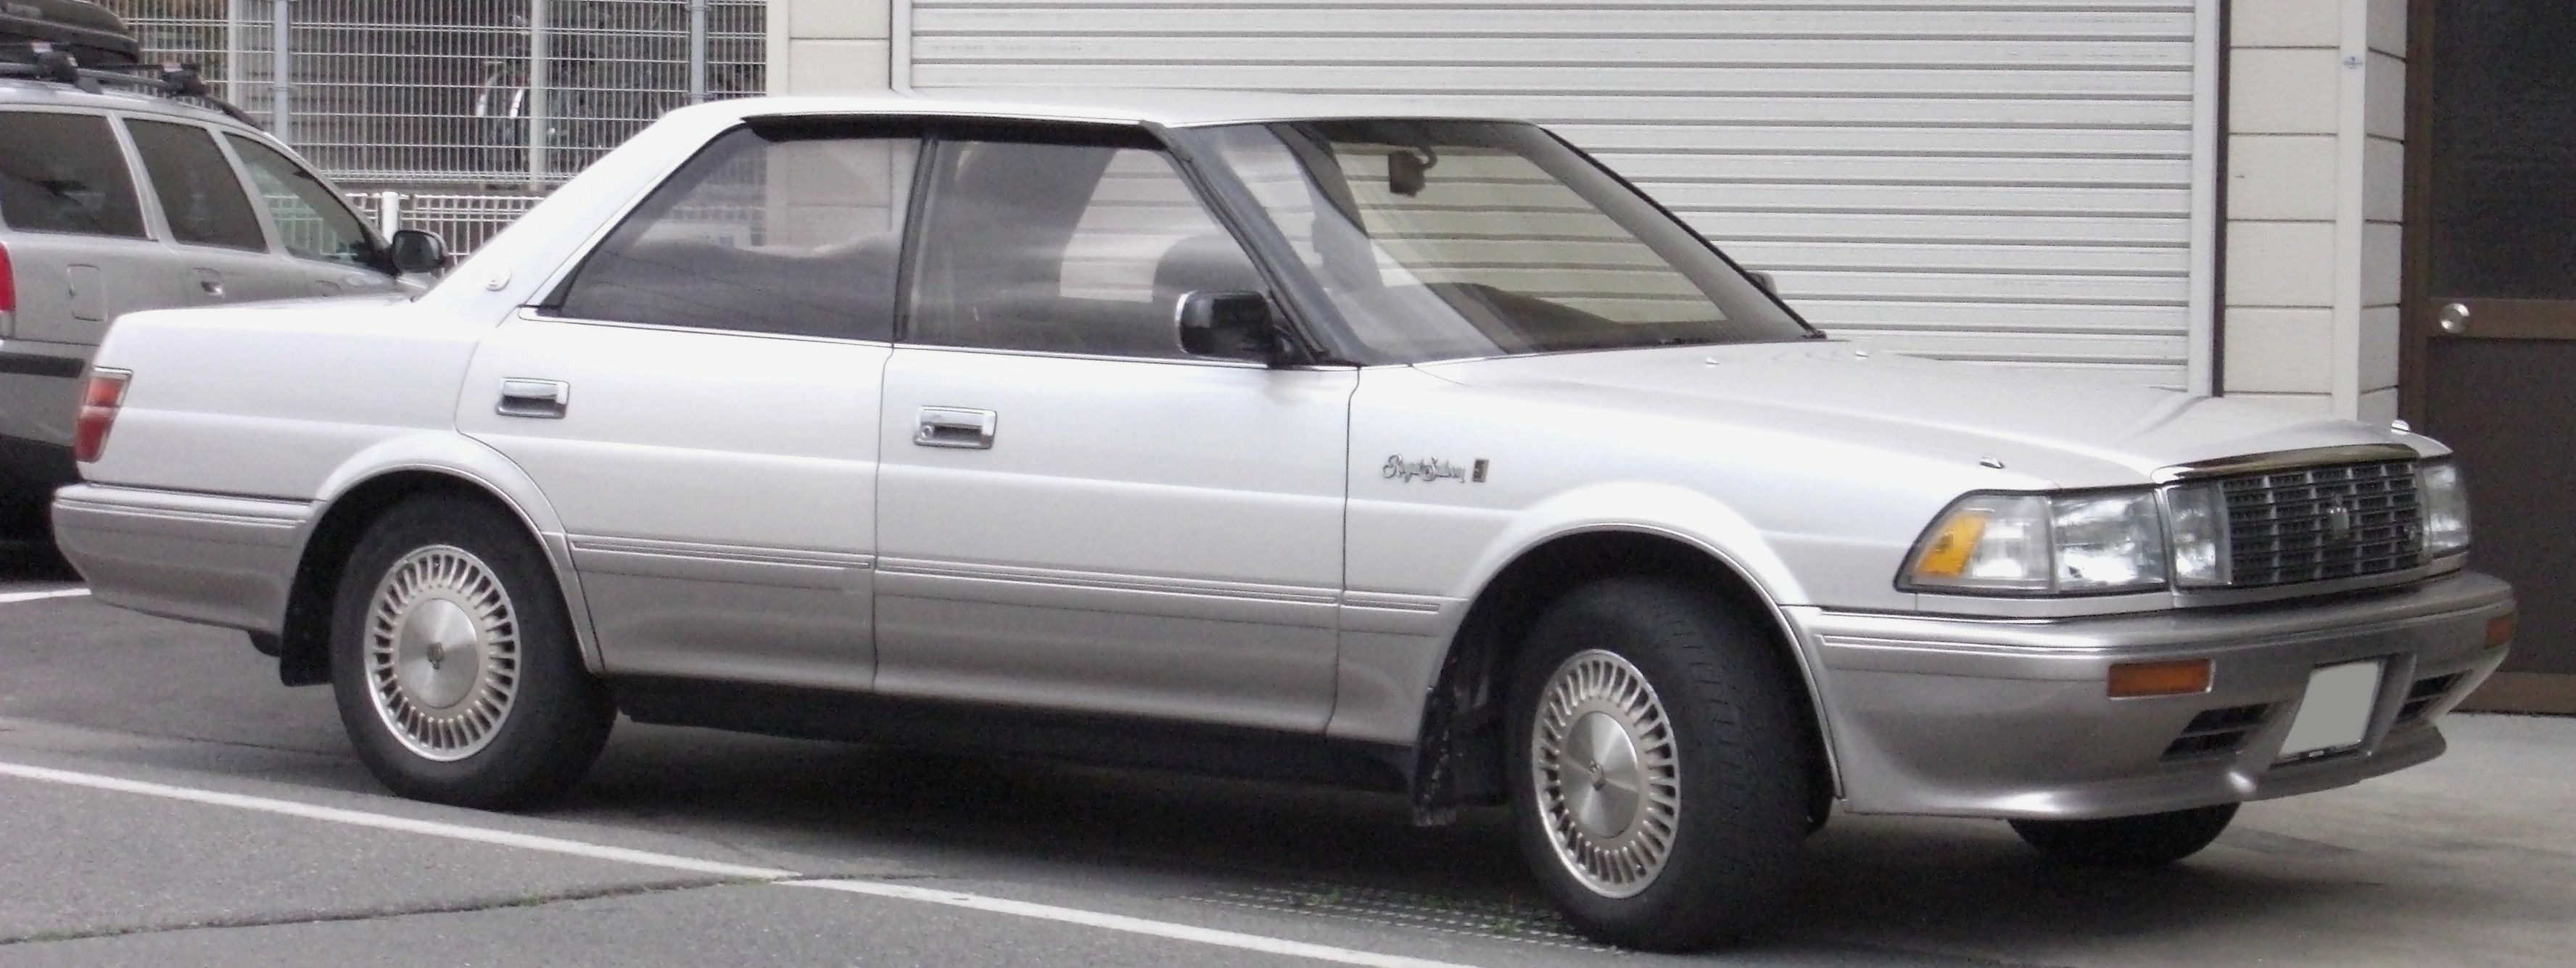 President S Car